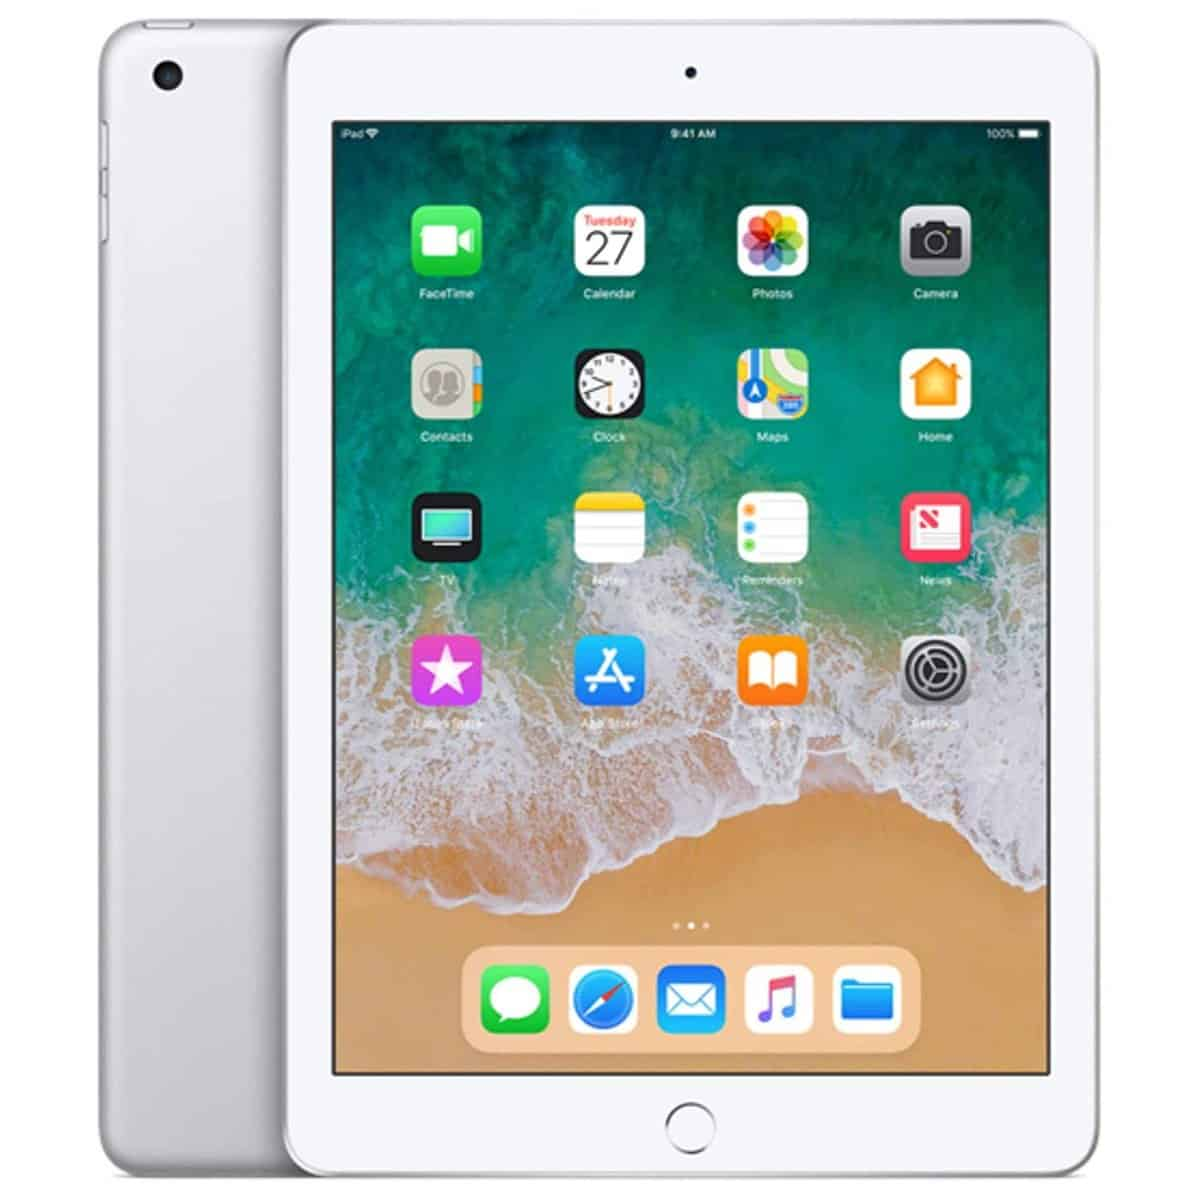 Apple iPad 3-sized